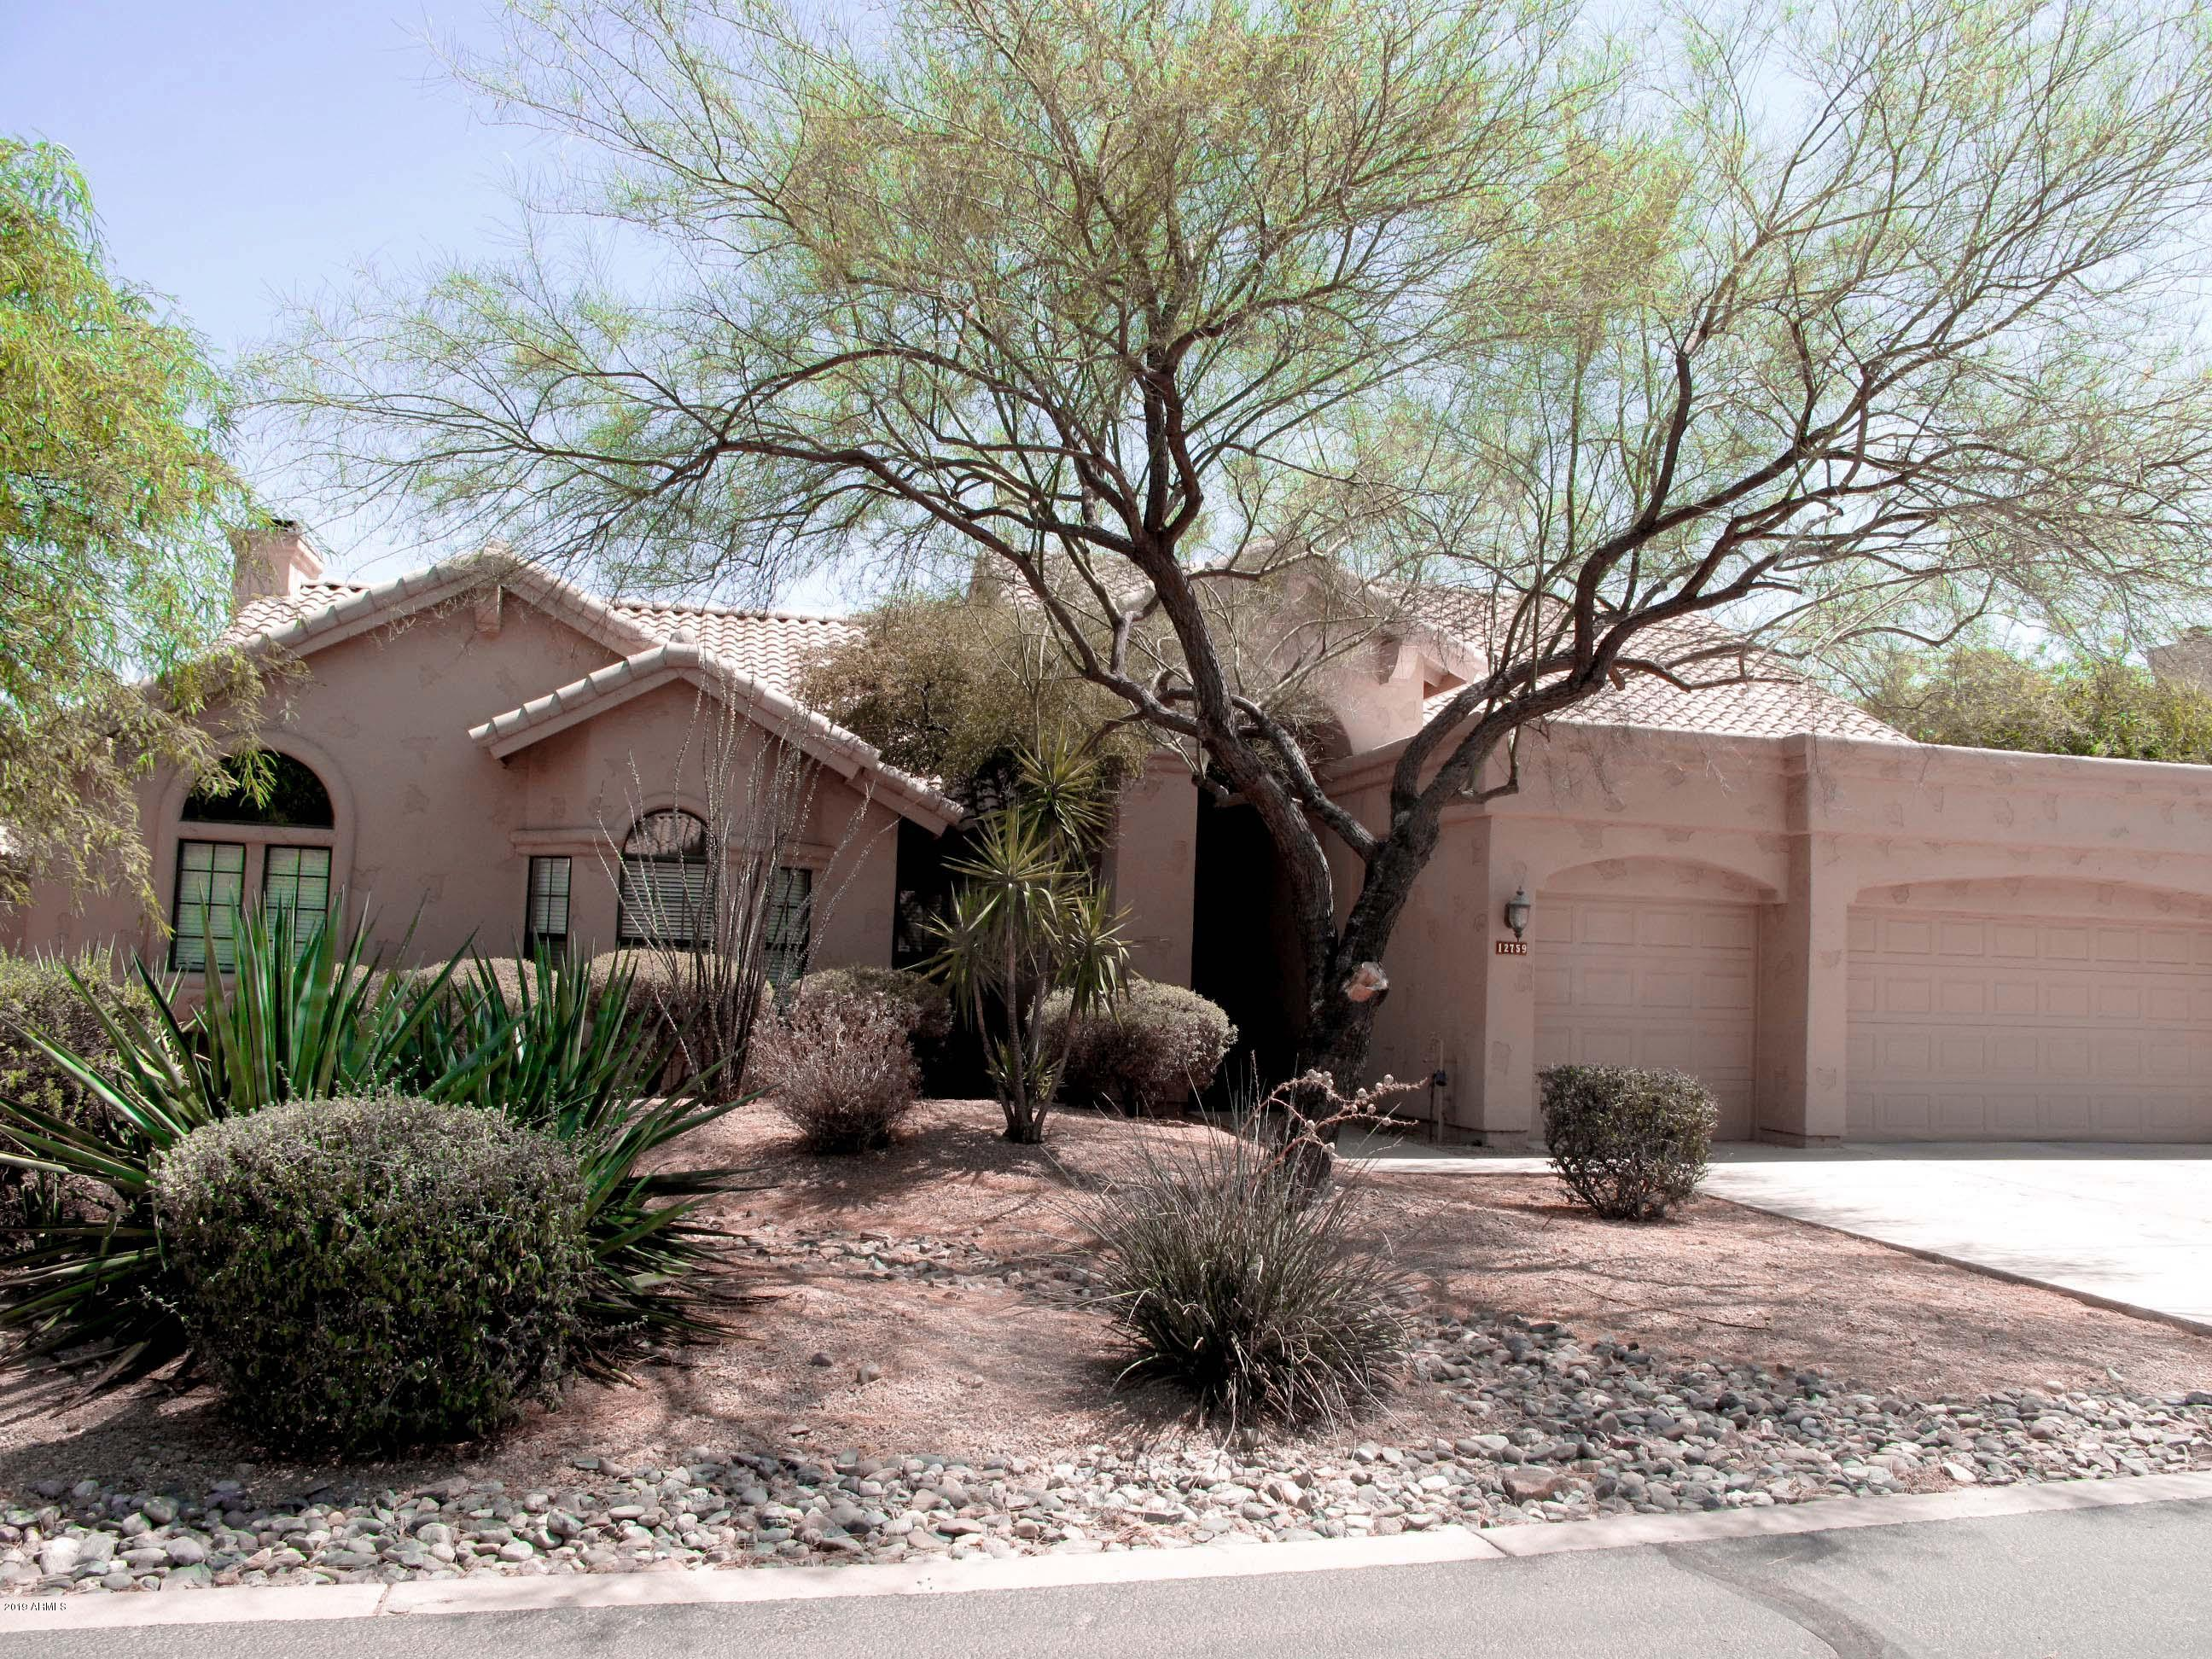 12759 E SUNNYSIDE Drive, Scottsdale AZ 85259